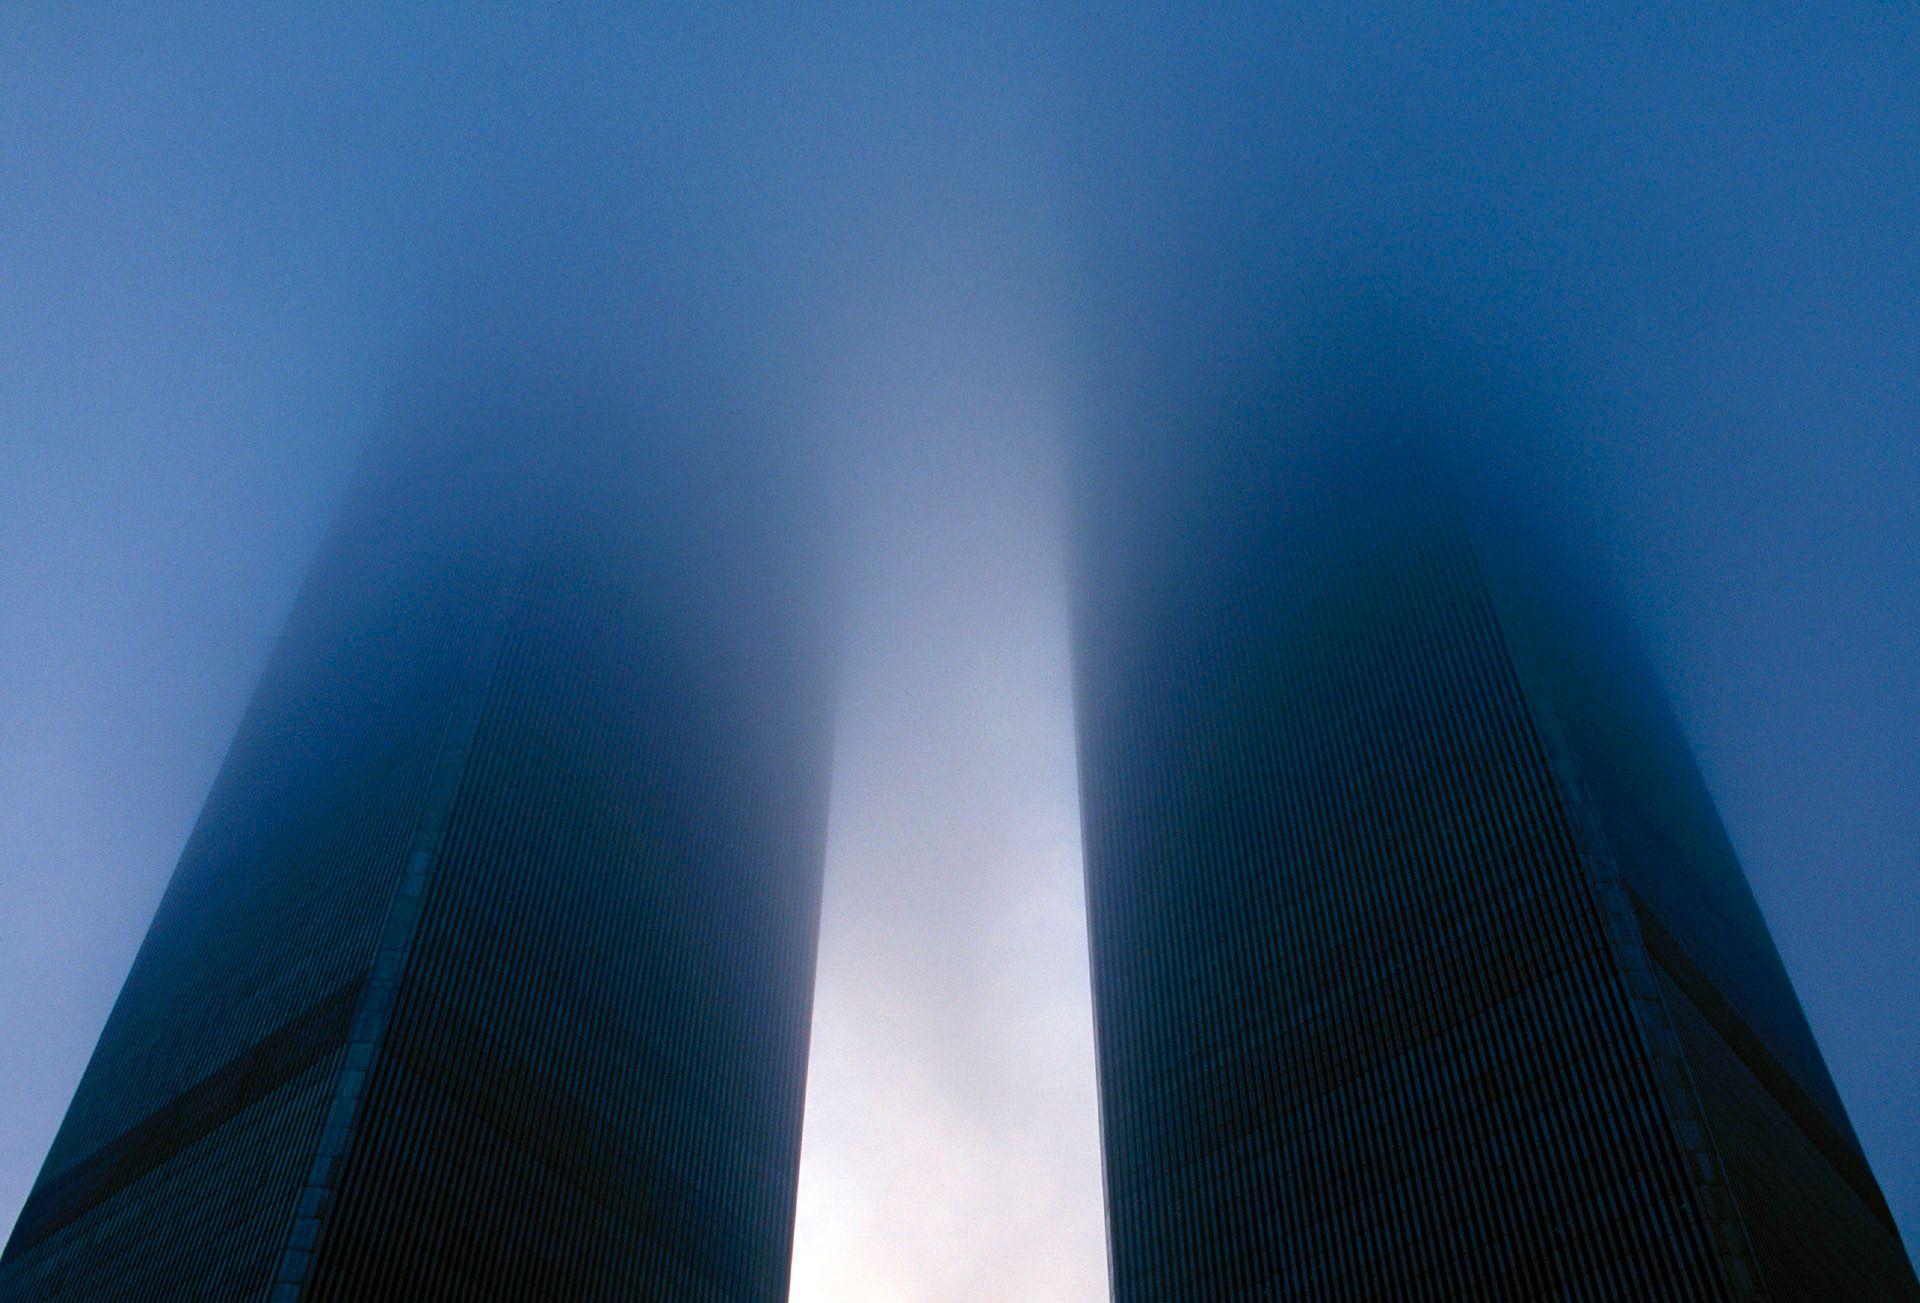 World Trade Center Towers